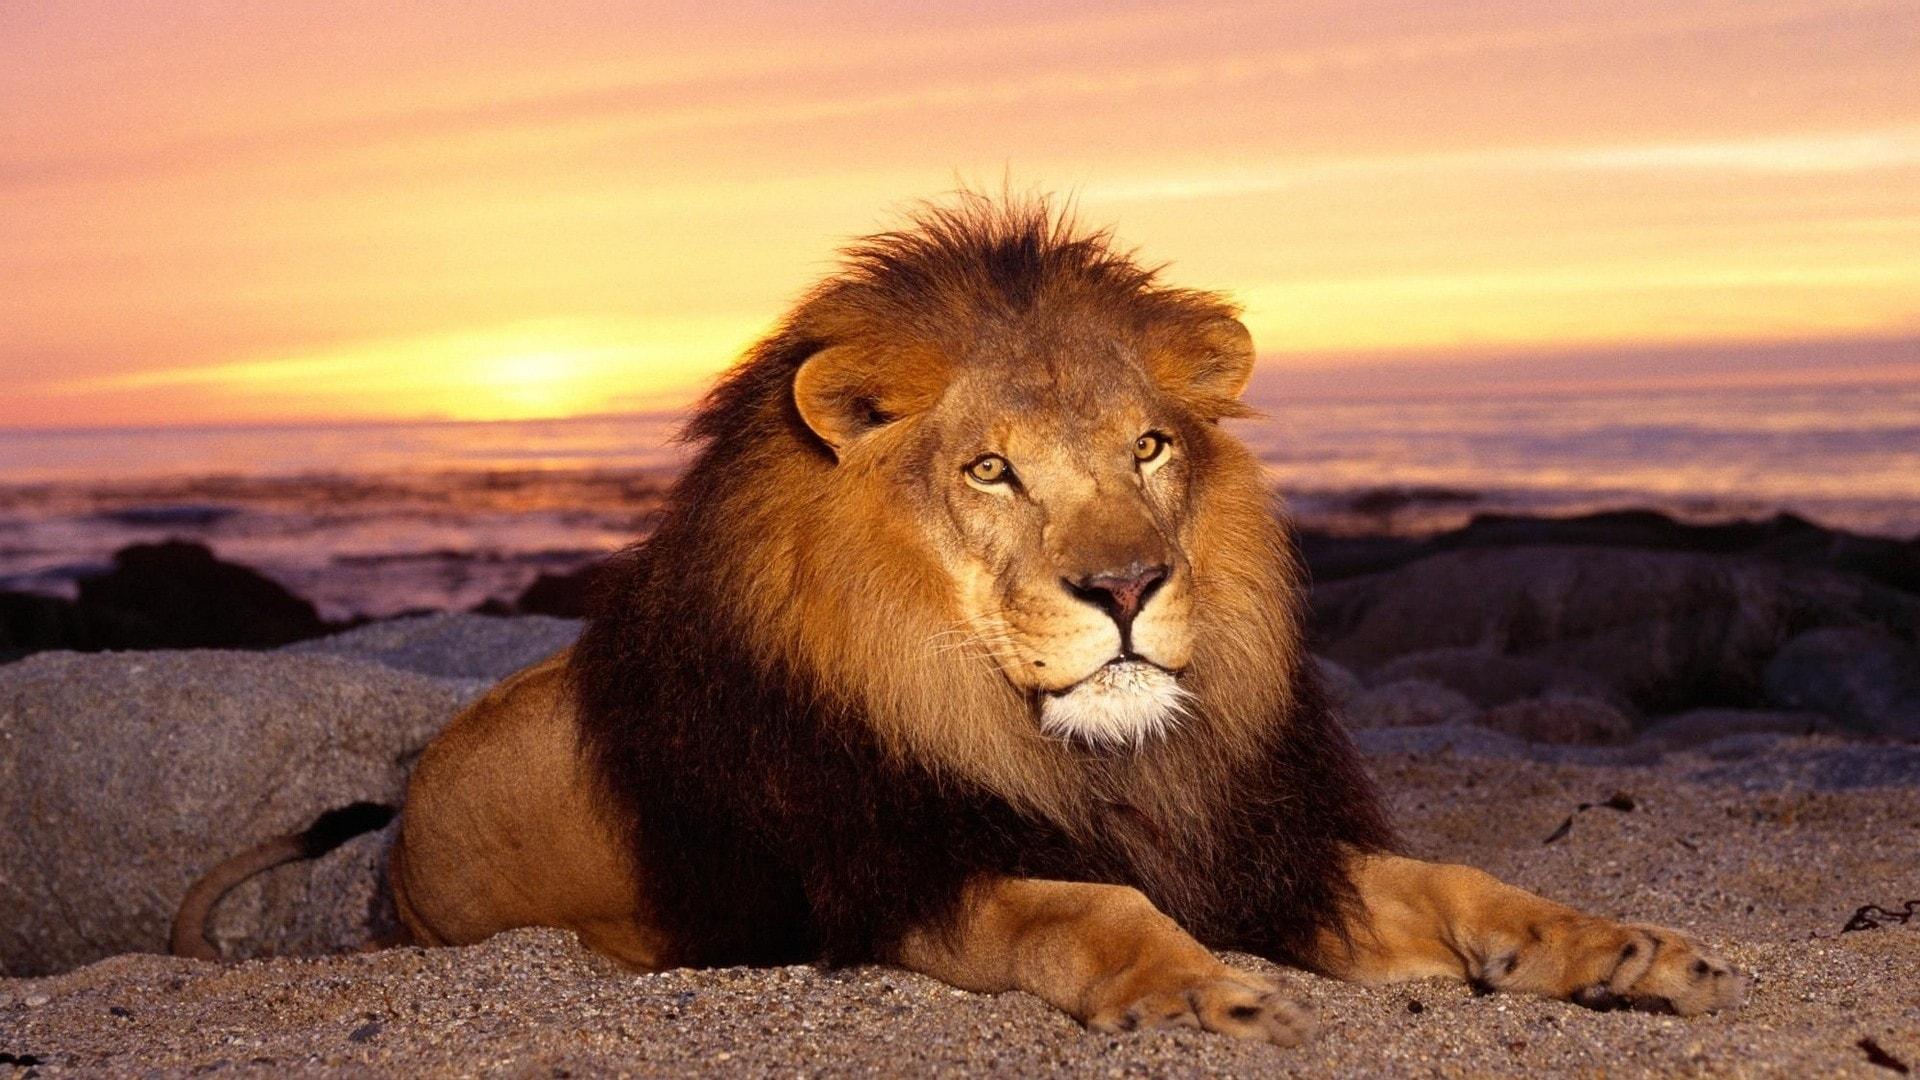 Lion desktop wallpapers